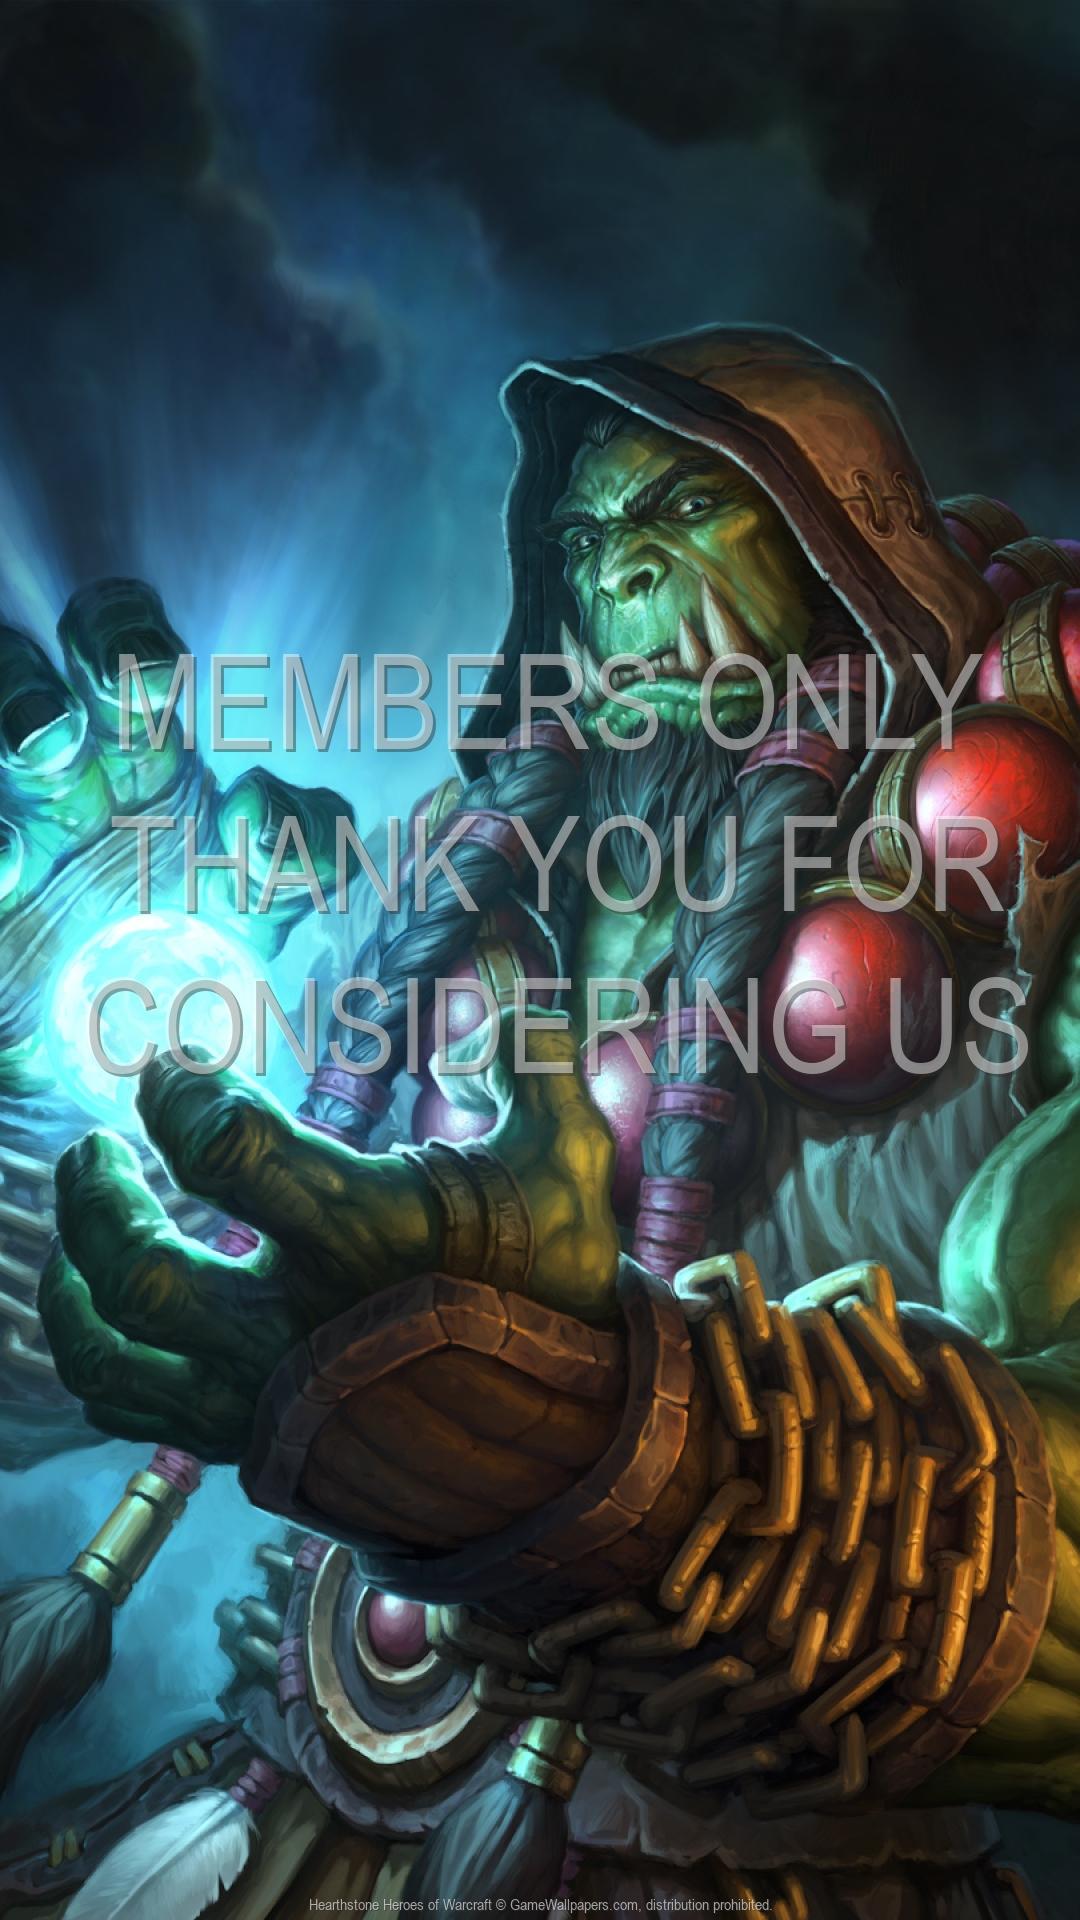 Hearthstone: Heroes of Warcraft 1920x1080 Handy Hintergrundbild 02